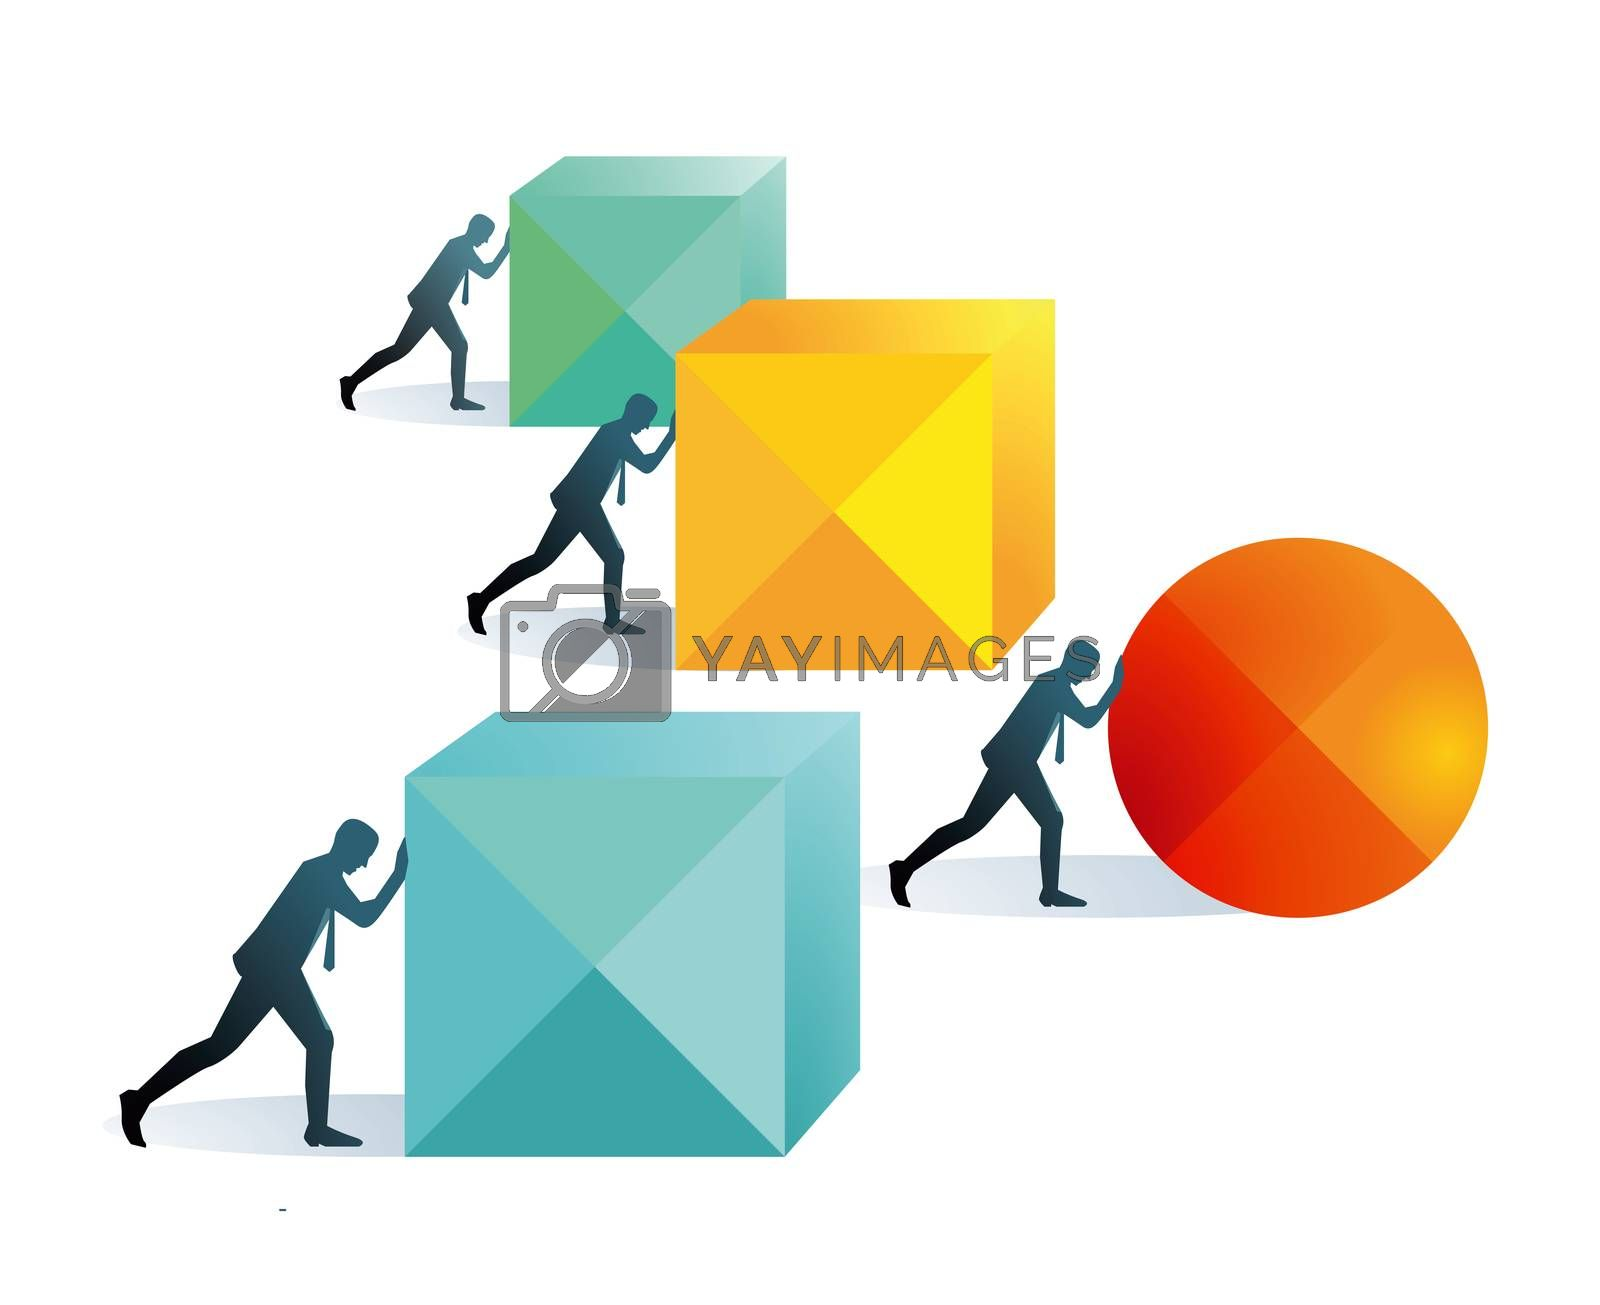 Pushing forward concept illustration,